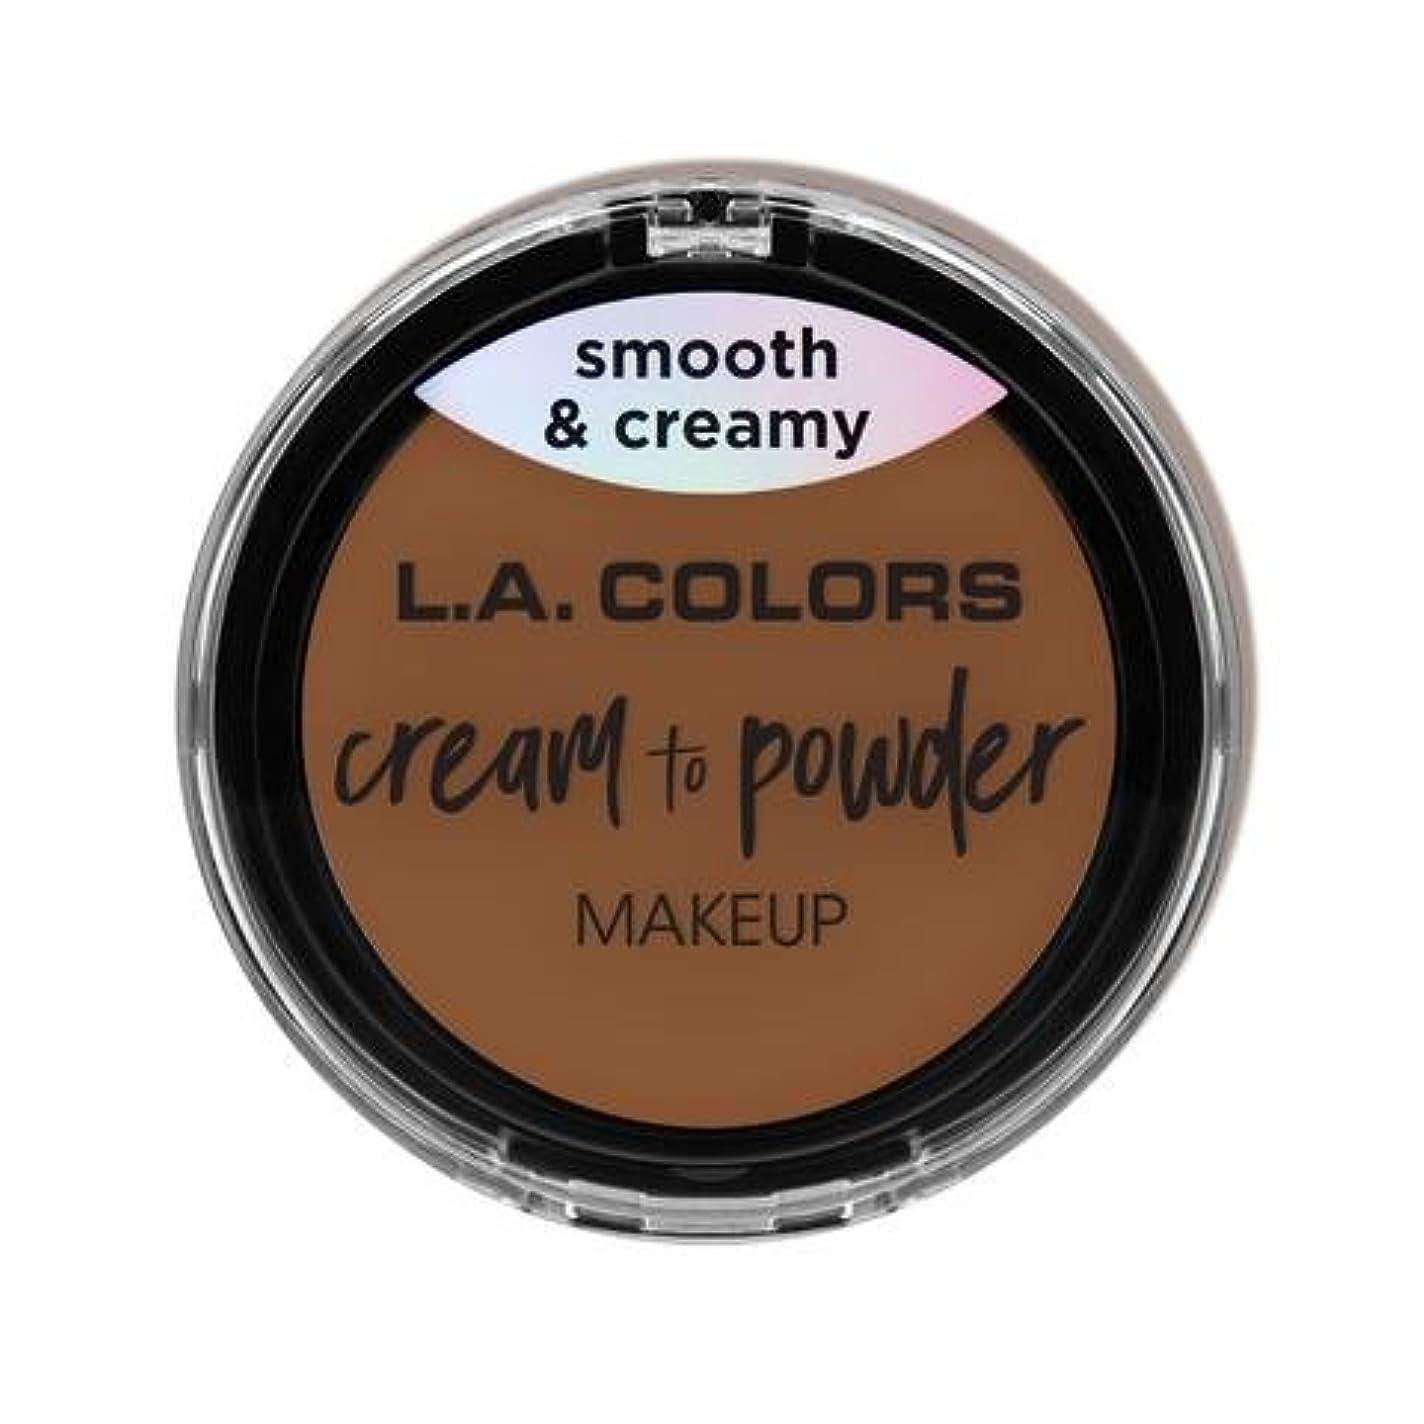 会員航空機偽物(3 Pack) L.A. COLORS Cream To Powder Foundation - Tan (並行輸入品)